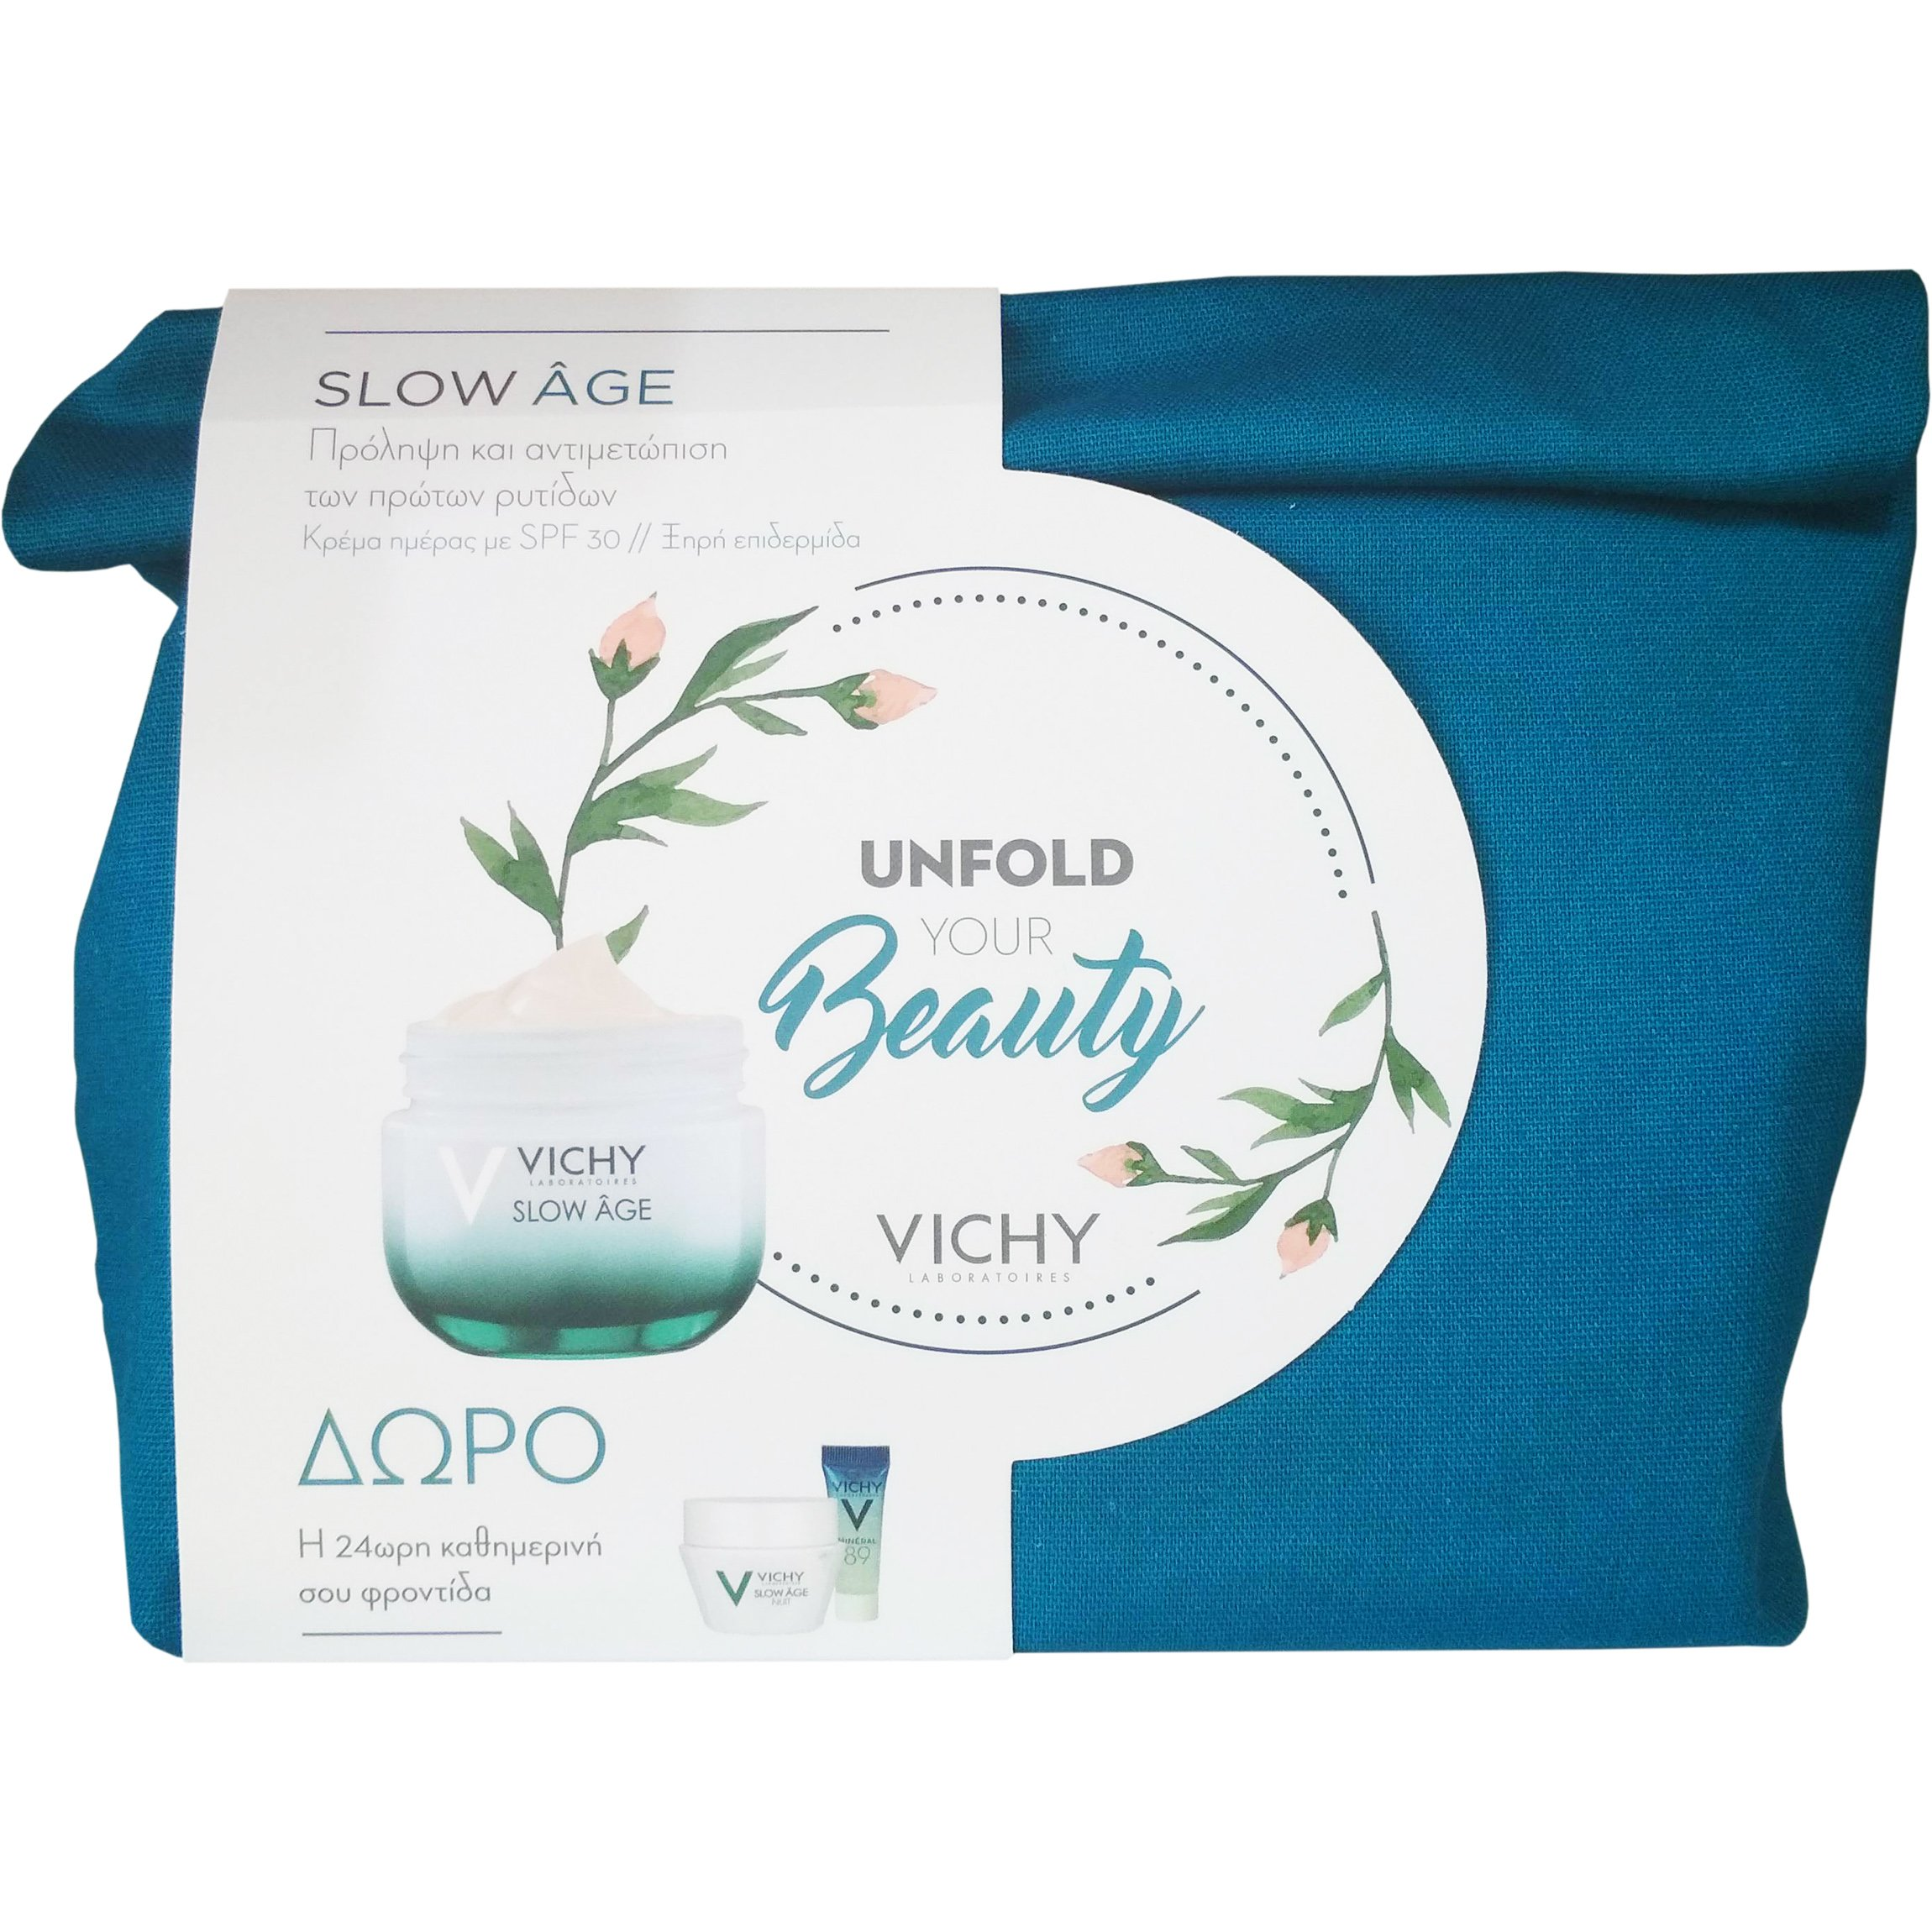 Vichy Πακέτο Προσφοράς Slow Age Cream Balm Spf30 για Ξηρή Επιδερμίδα 50ml & Δώρο Slow Age Night 15ml,Mineral 89,4ml